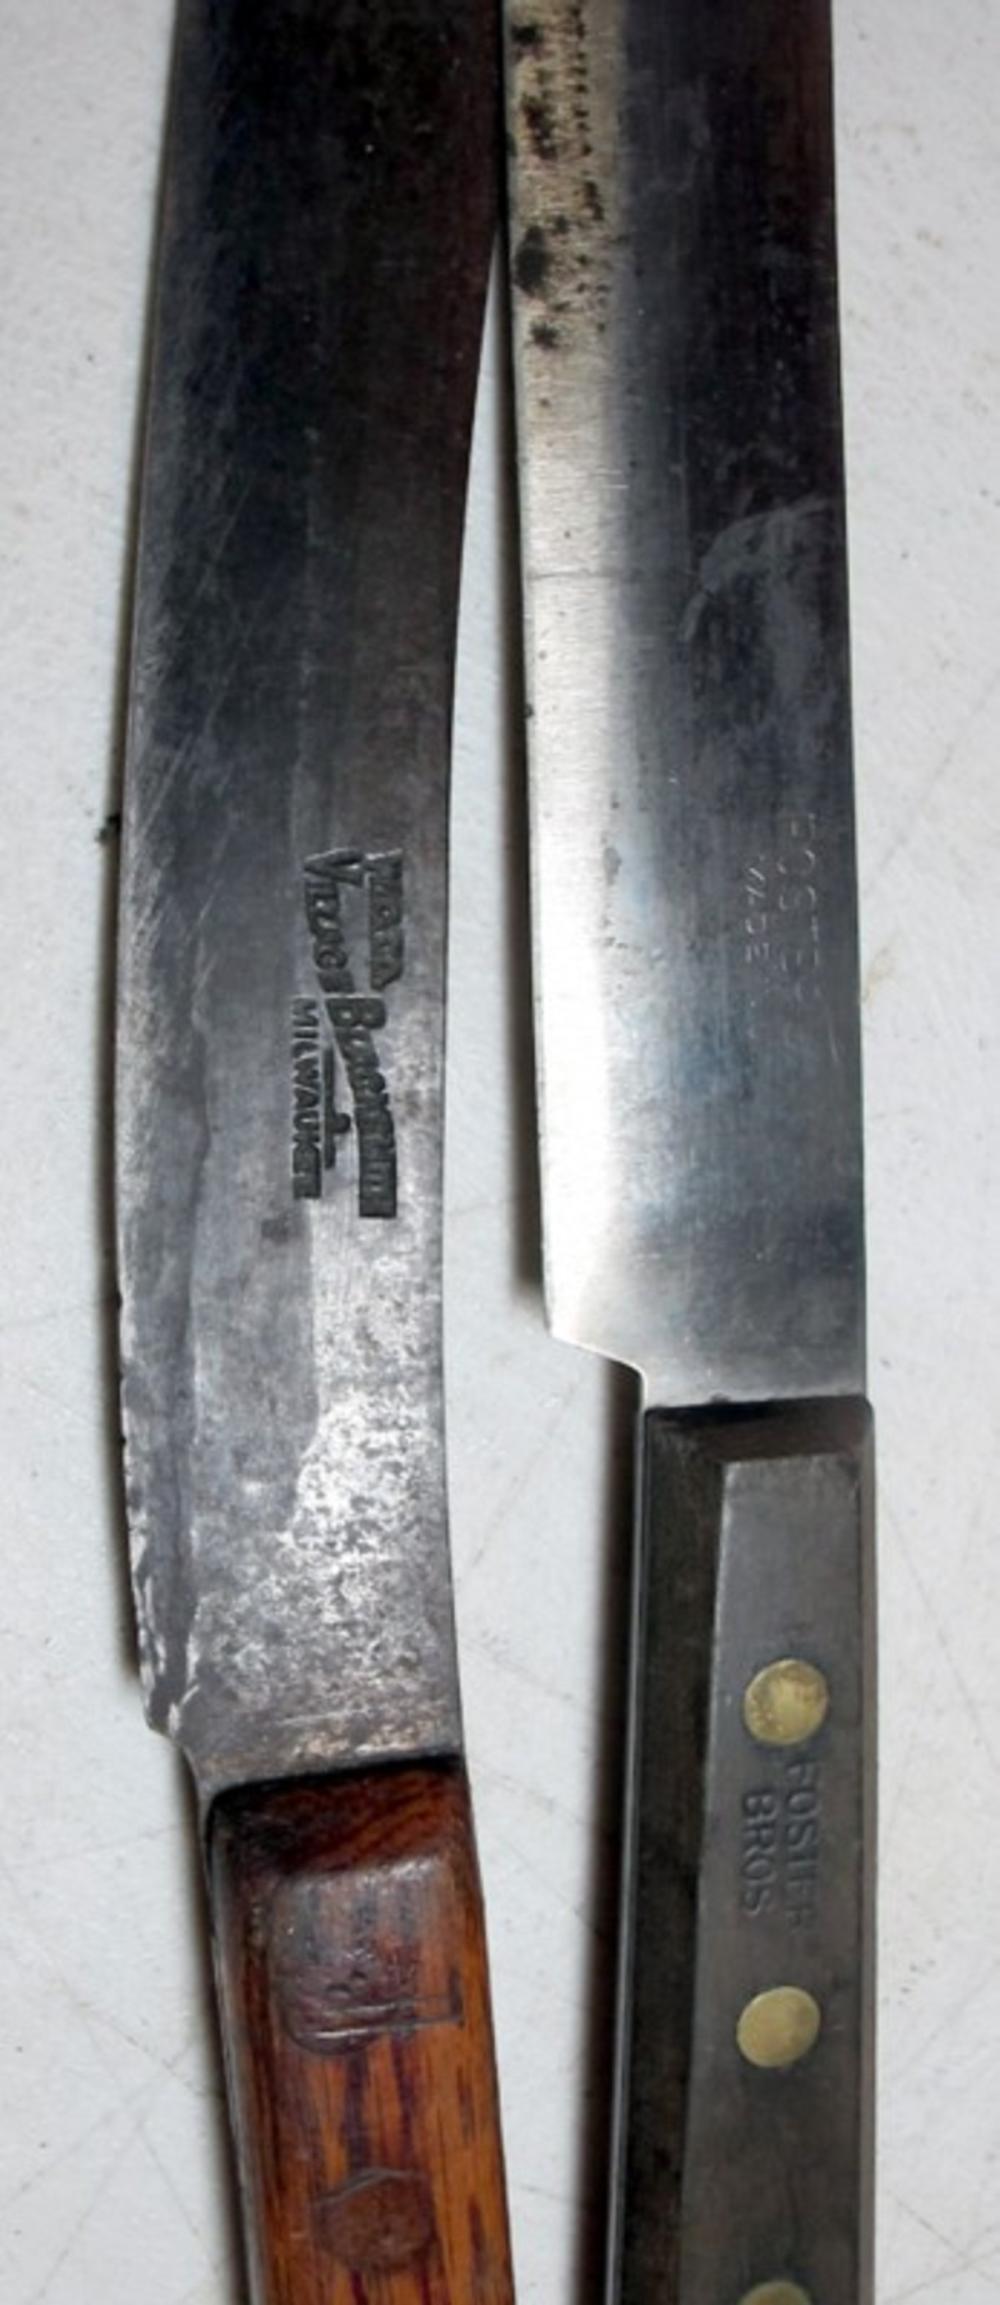 Lot 159: 5 DIFF ANTIQUE BUTCHER KITCHEN KNIFE KNIVES FOSTER BROS CARVED HANDLE VILLAGE BLACKSMITH MILWAUKEE ETC